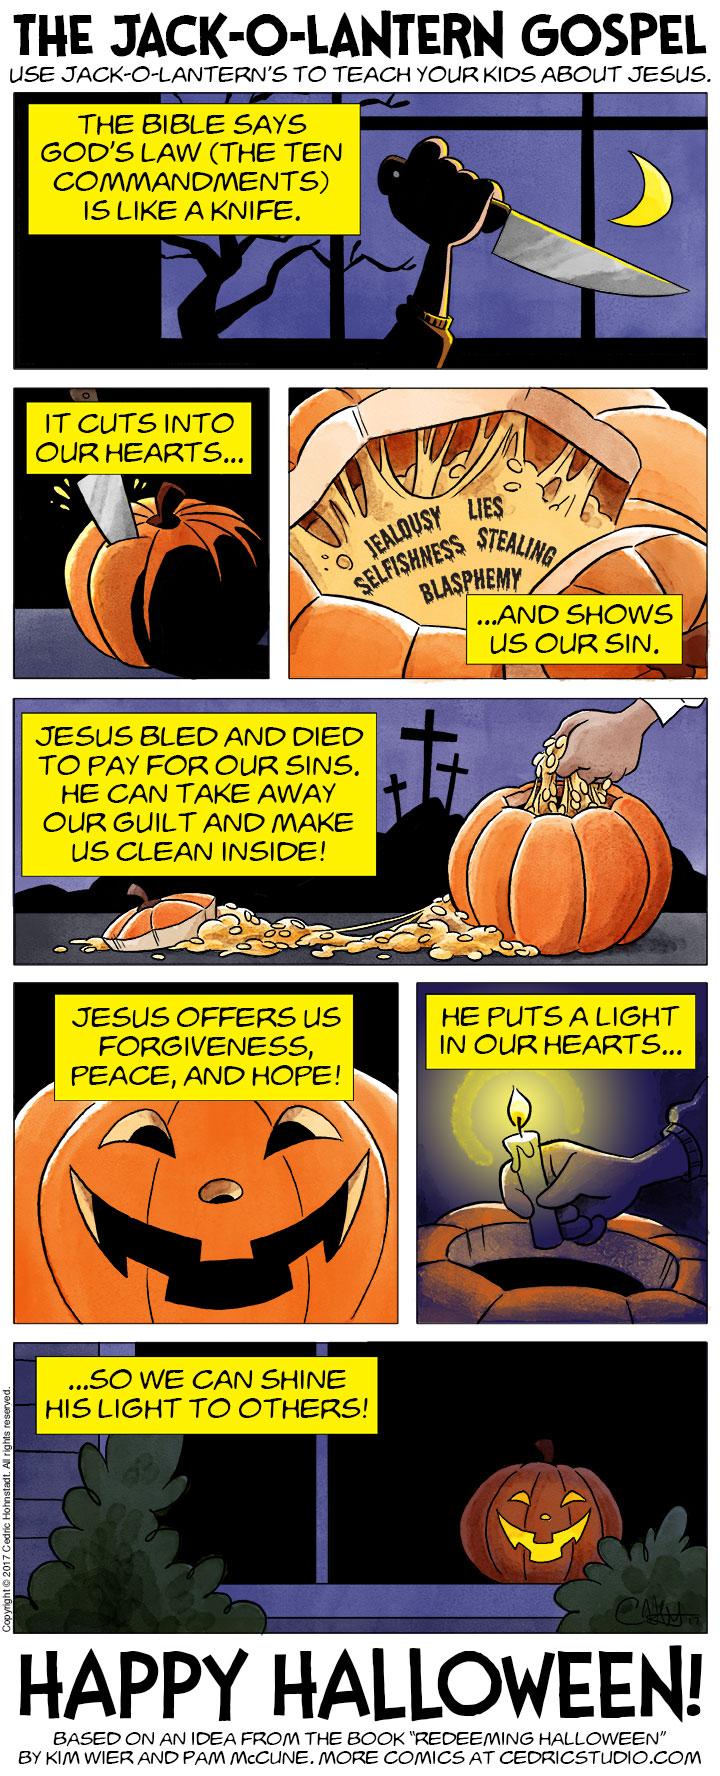 The Jack-O-Lantern Gospel